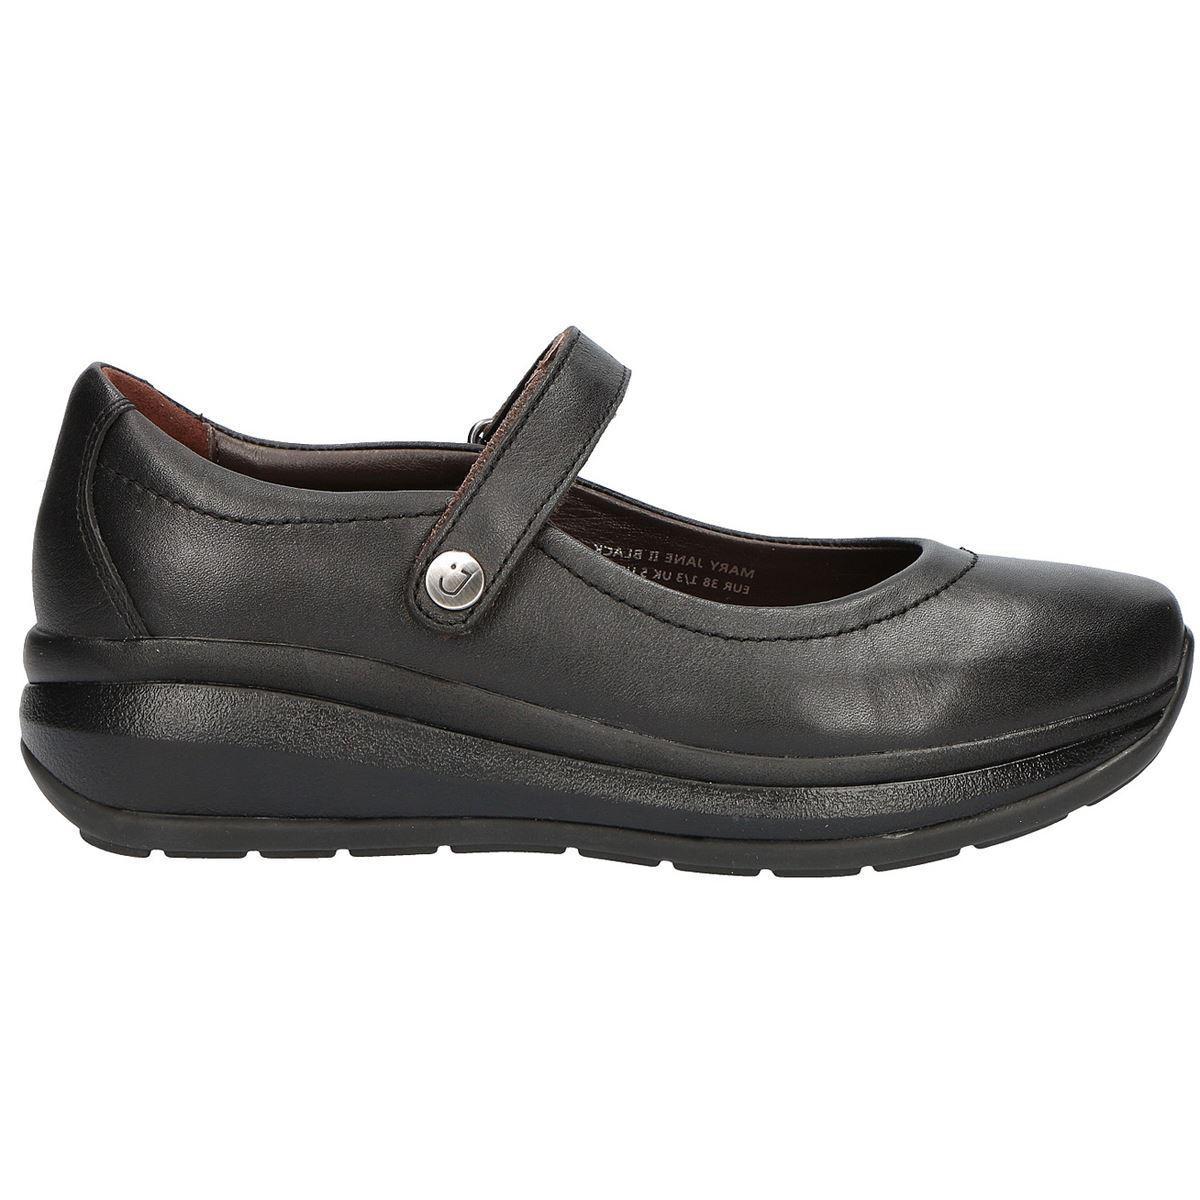 Joya Mary Jane 2 Black Womens Comfort Mary Jane Sandals All Sizes